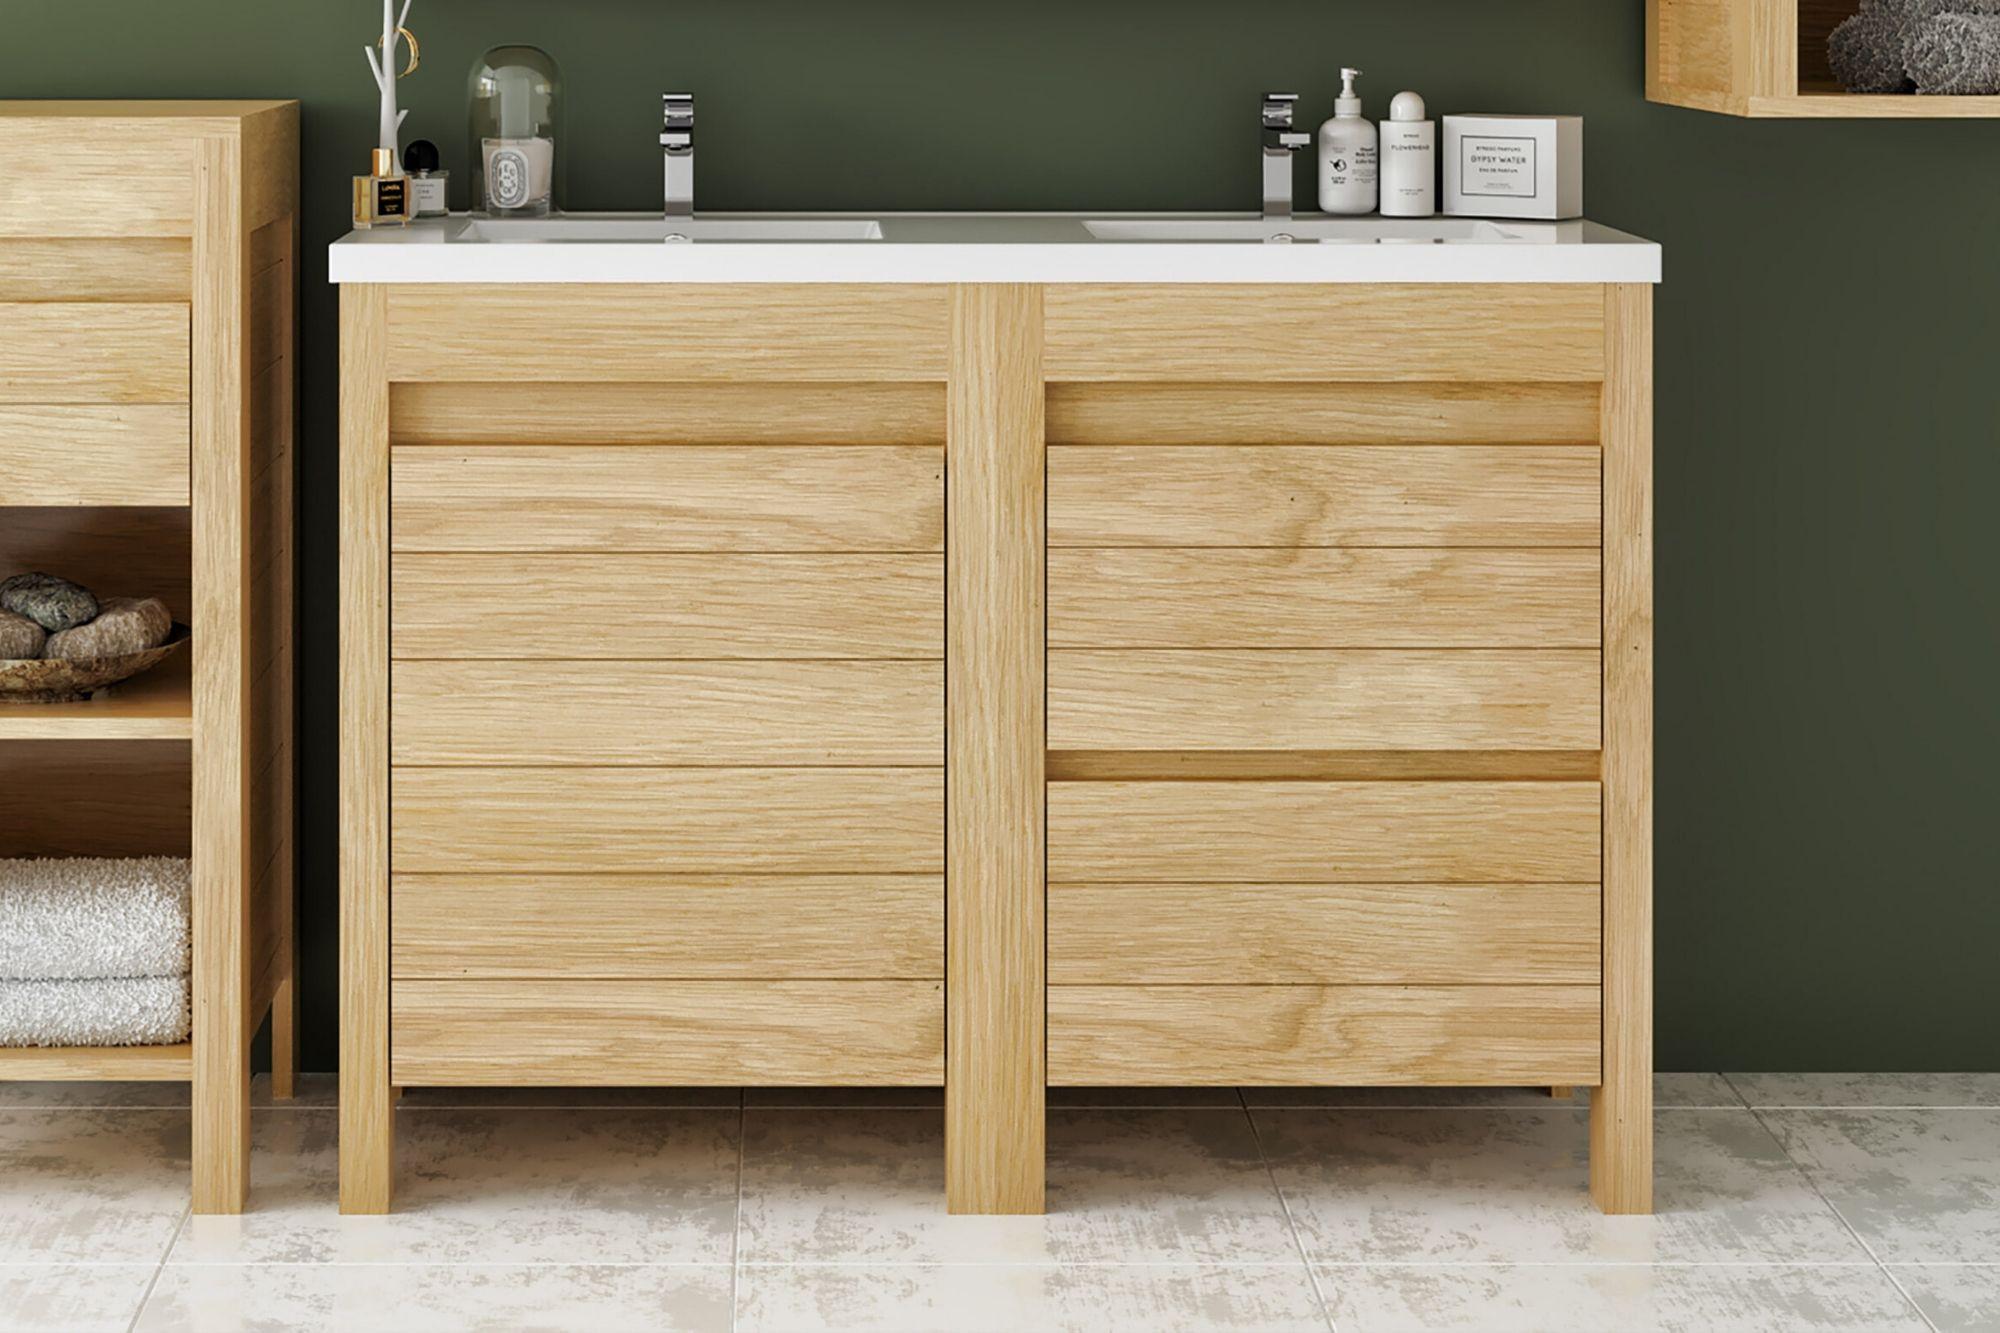 Meuble de salle de bain 15 cm en chêne massif avec double vasque - Hellin